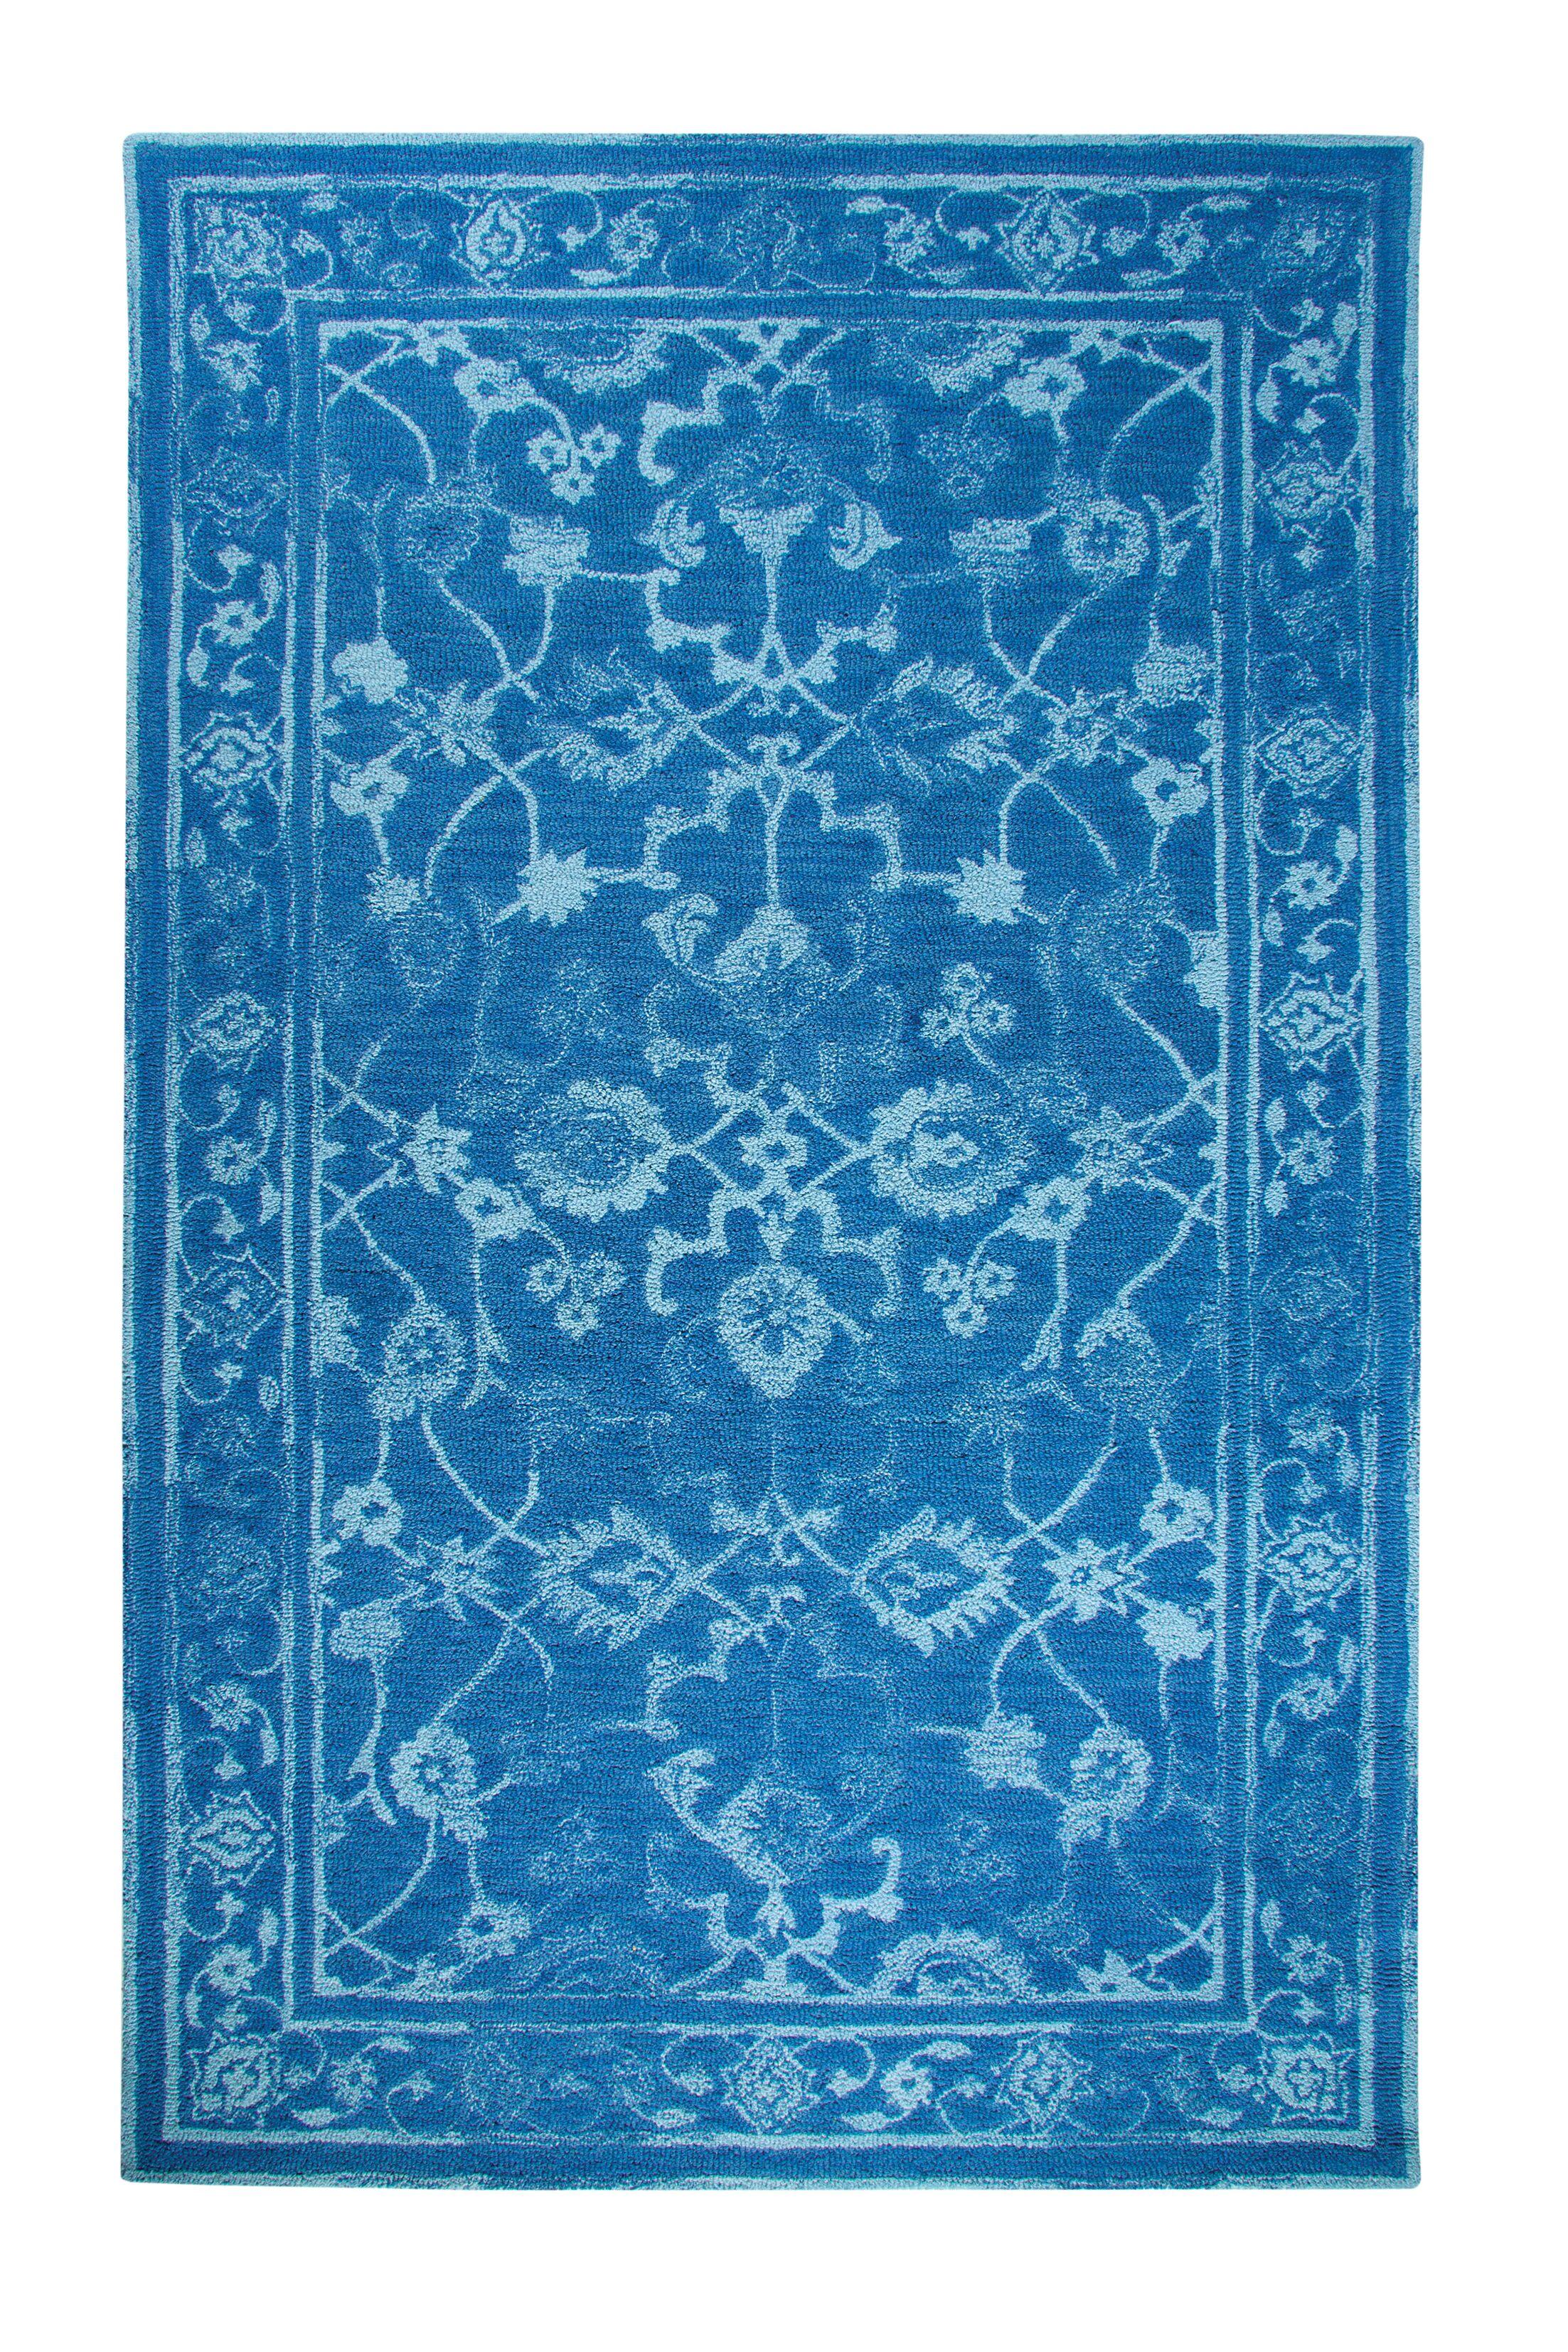 Montoya Dark Blue Area Rug Rug Size: Rectangle 5' x 8'